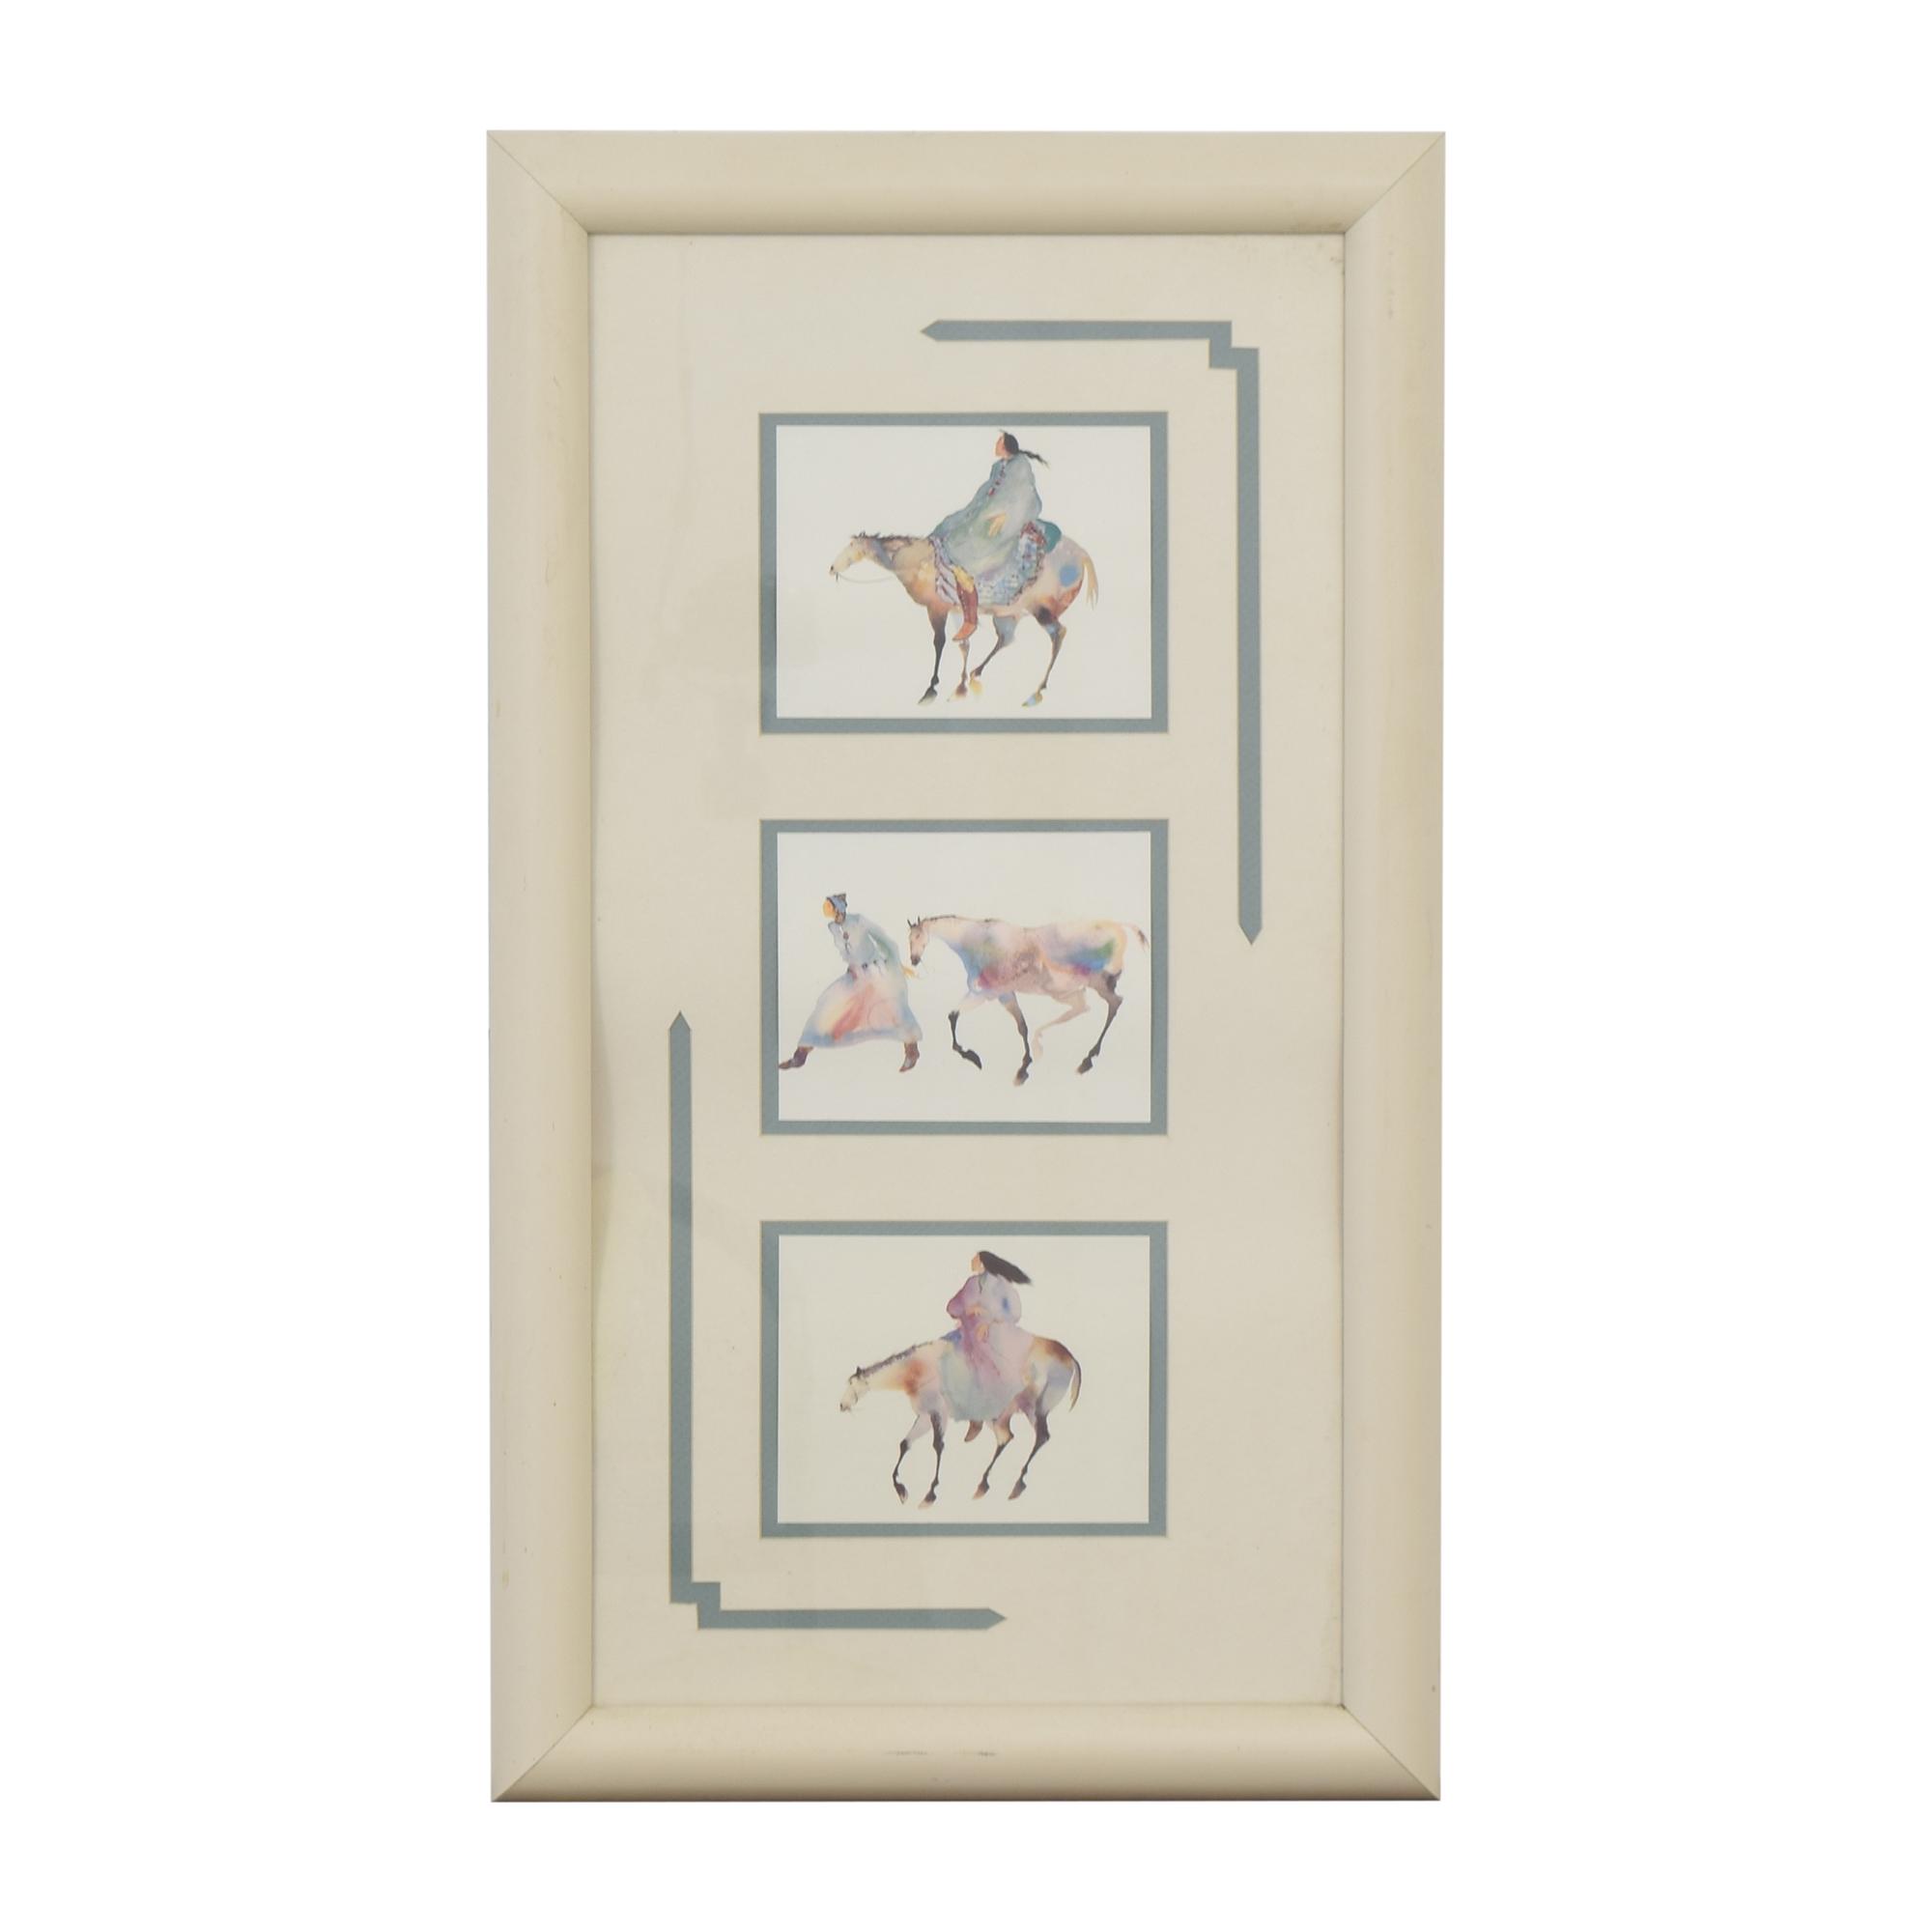 Framed Equestrian Wall Art dimensions